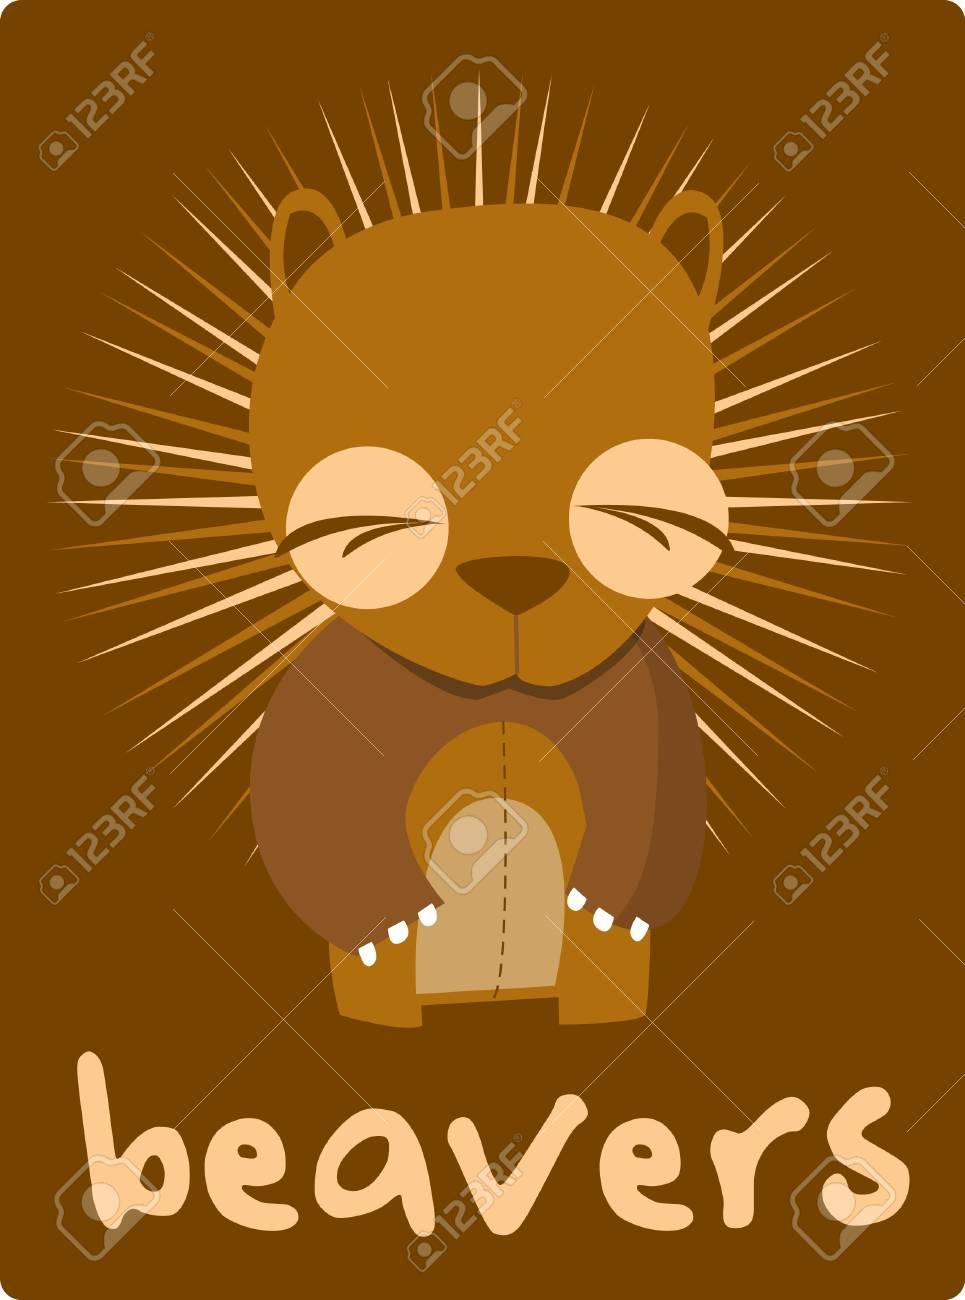 beavers Stock Vector - 14653619